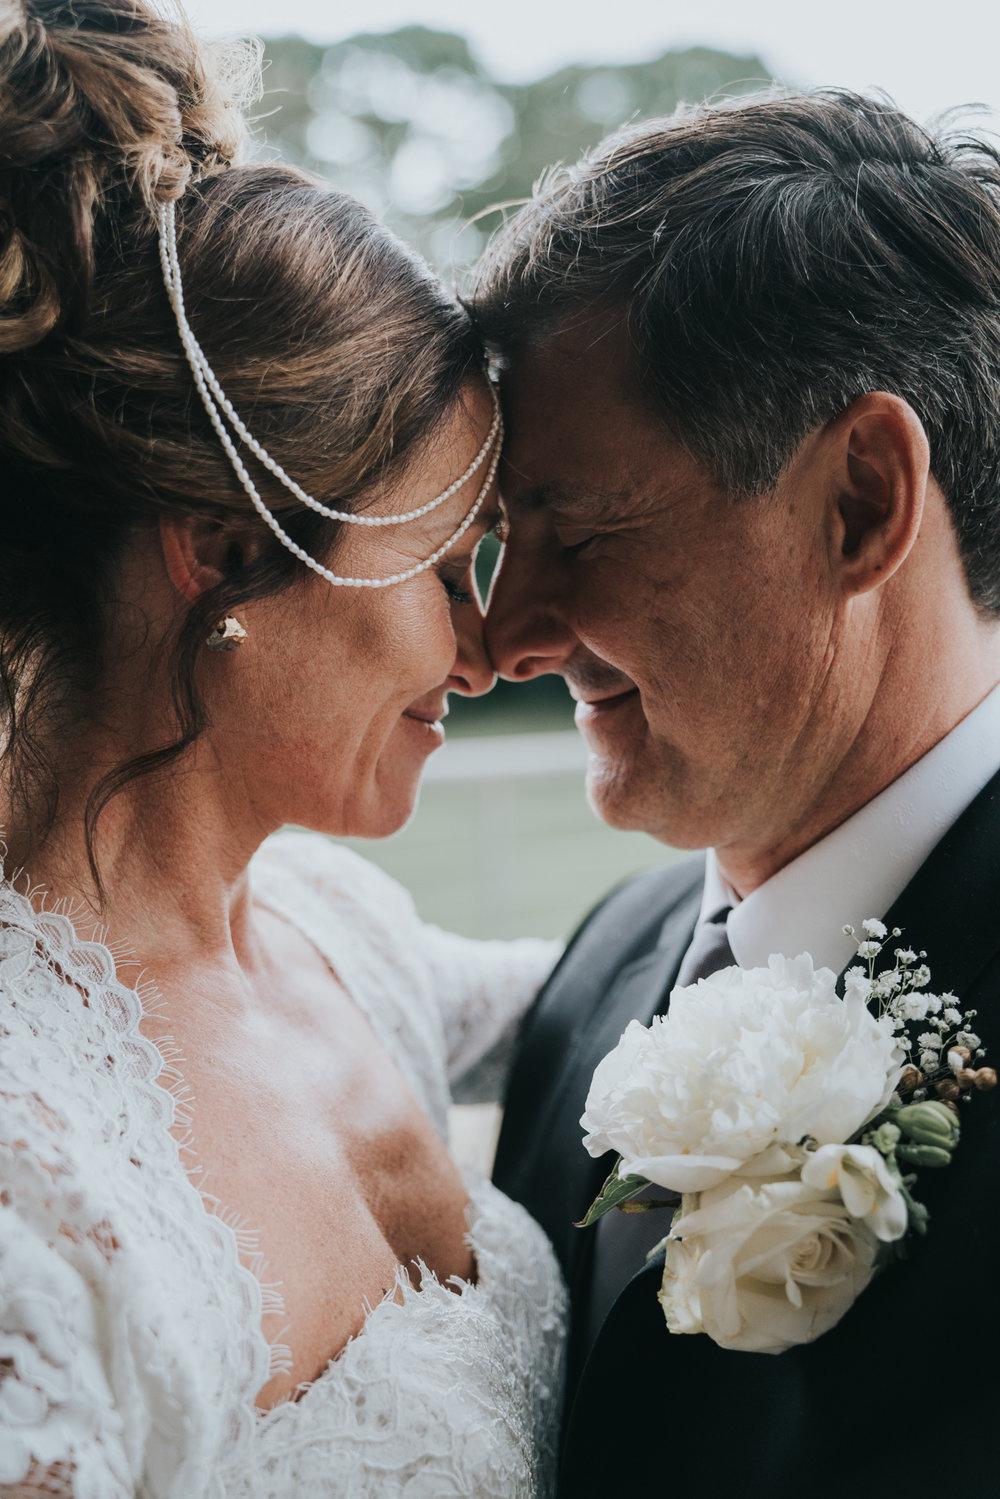 grace-elizabeth-boho-wedding-headingham-castle-essex-wedding-photographer-50.jpg